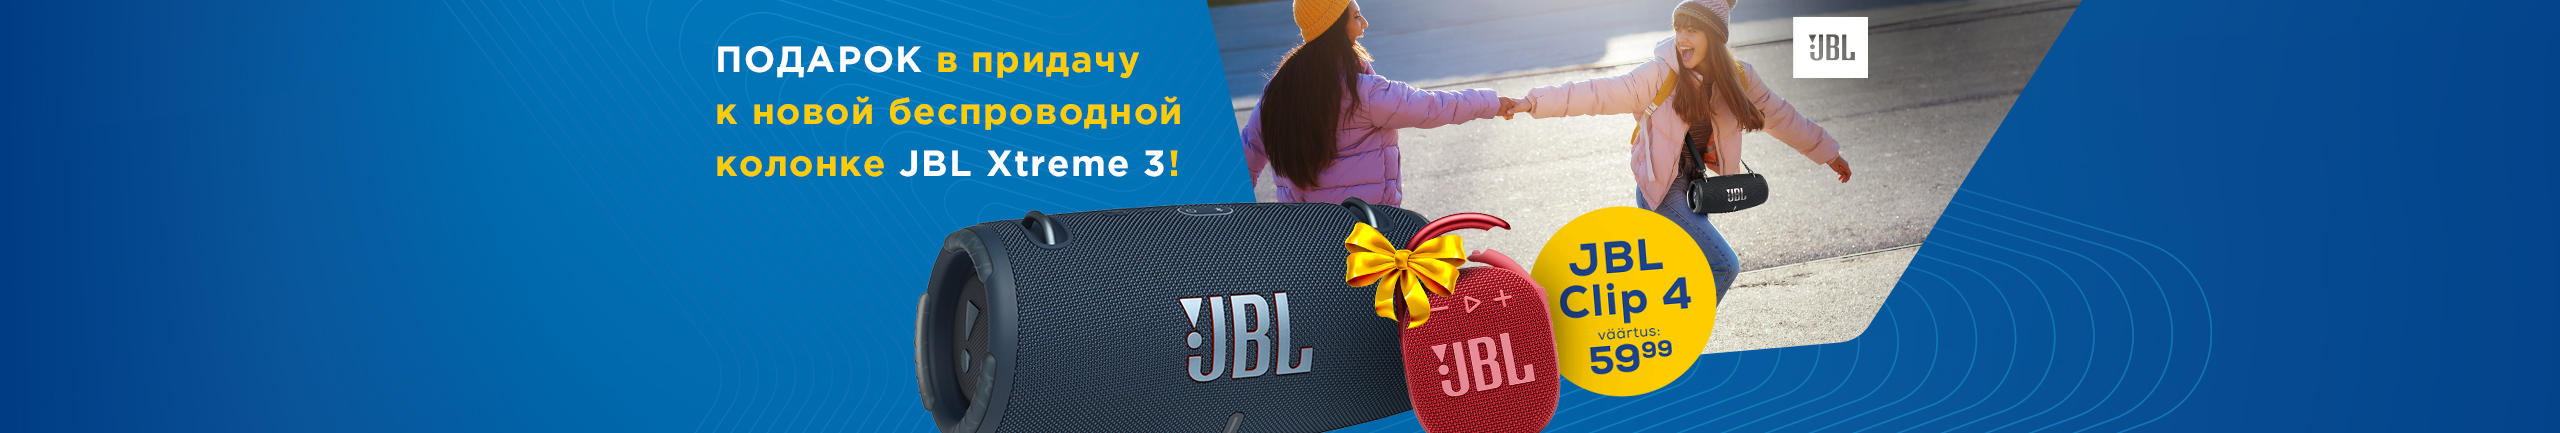 Купите колонку JBL Xtreme 3 и получите в подарок JBL Clip 4